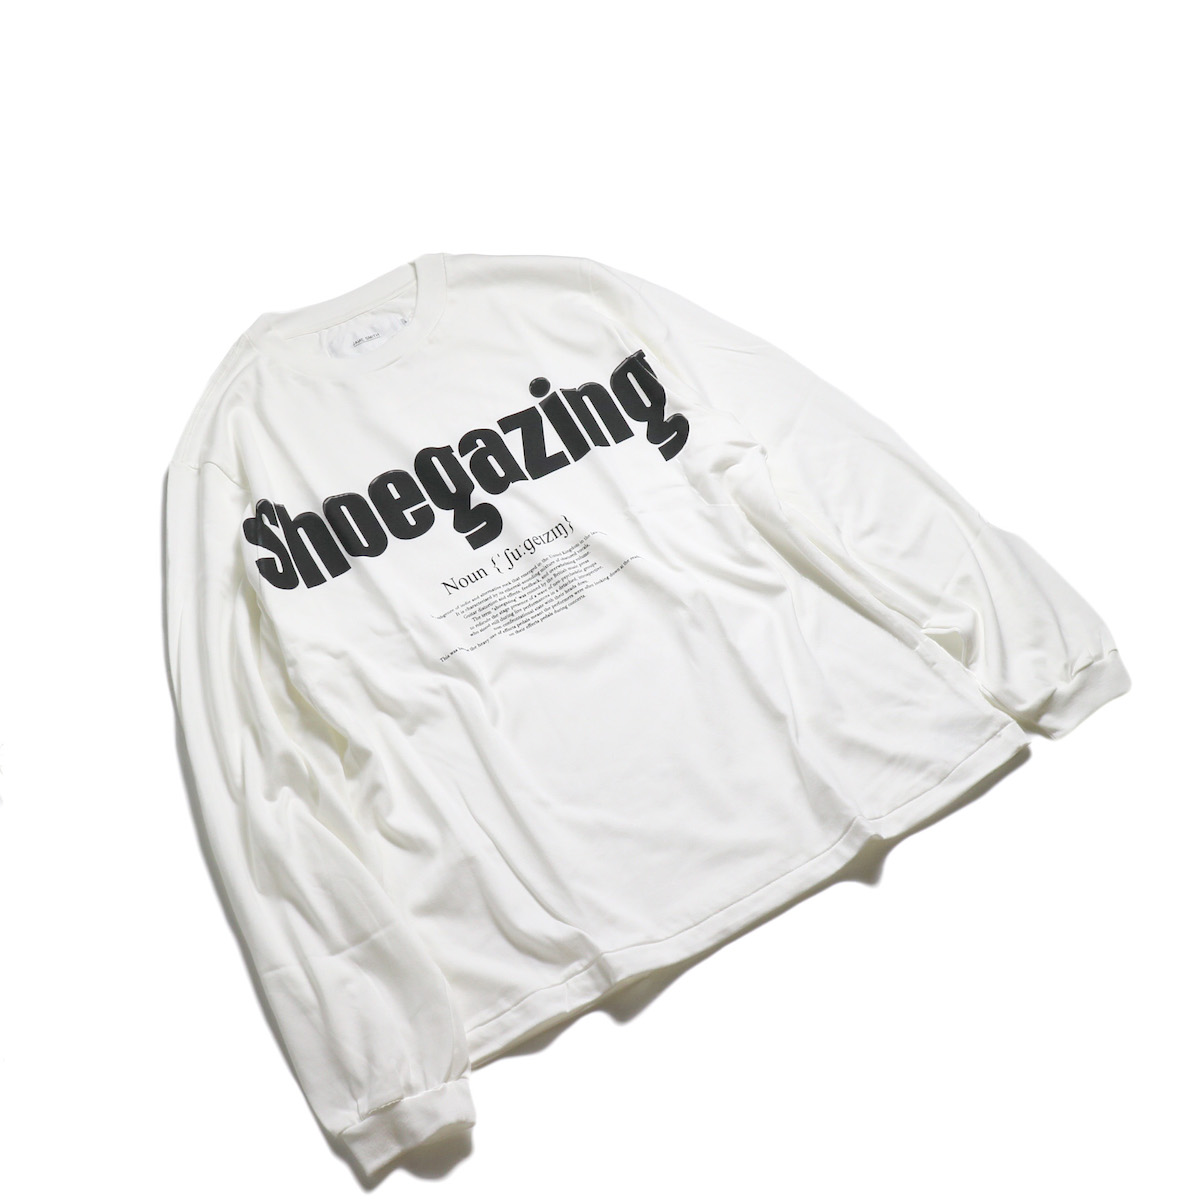 JANE SMITH / SHOEGAZING L/S T-SHIRT -White 全体